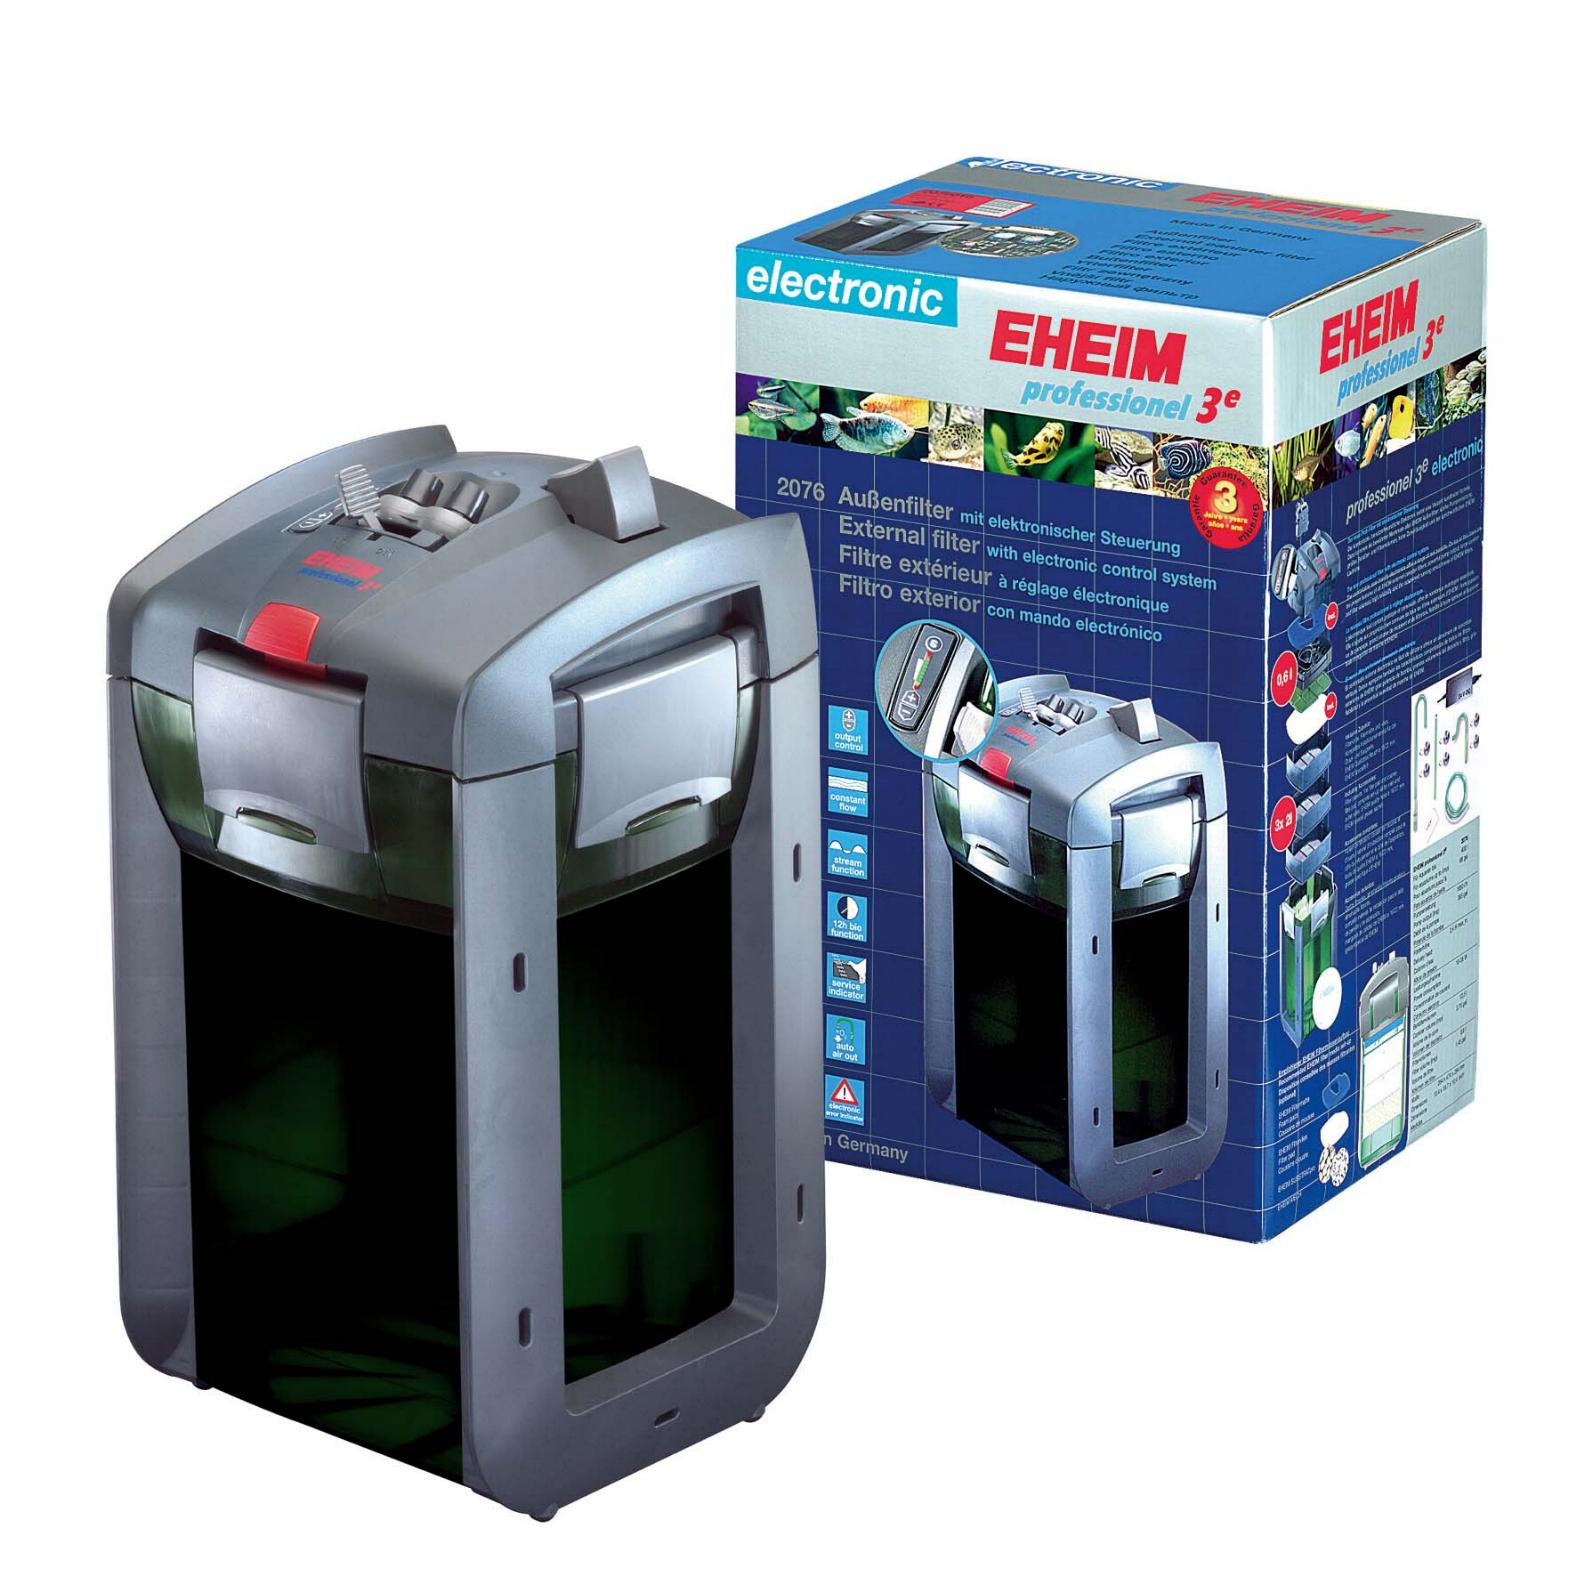 EHEIM GmbH amp; Co. KG EHEIM professionel 3e 450 (2076)